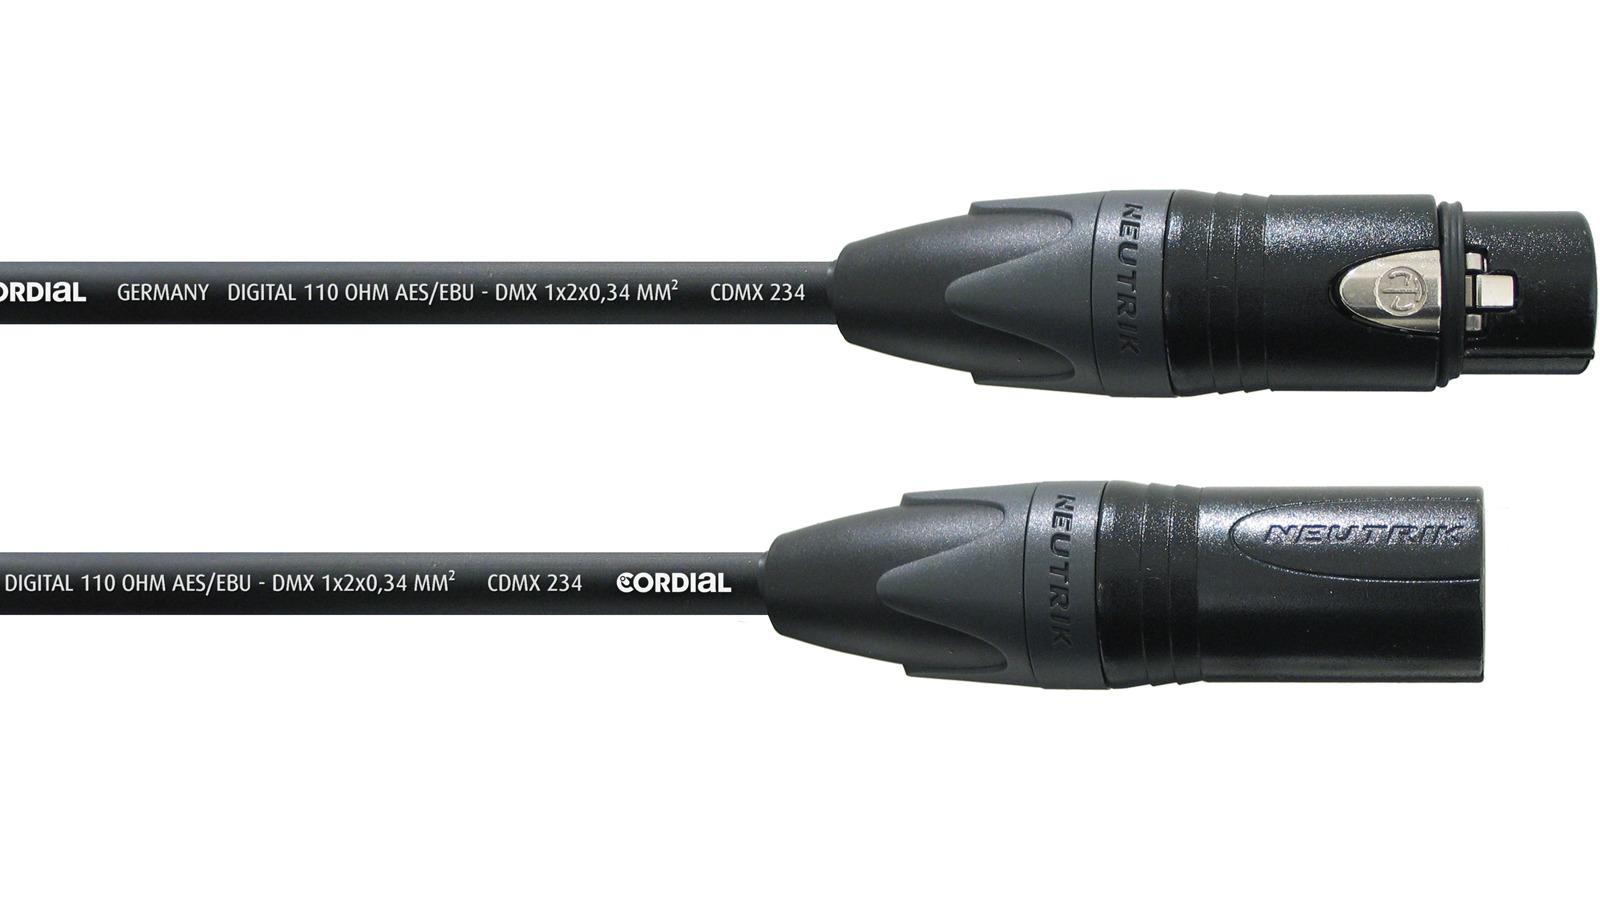 Cordial AES/EBU DMX Kabel 2 m CPD 2 FM